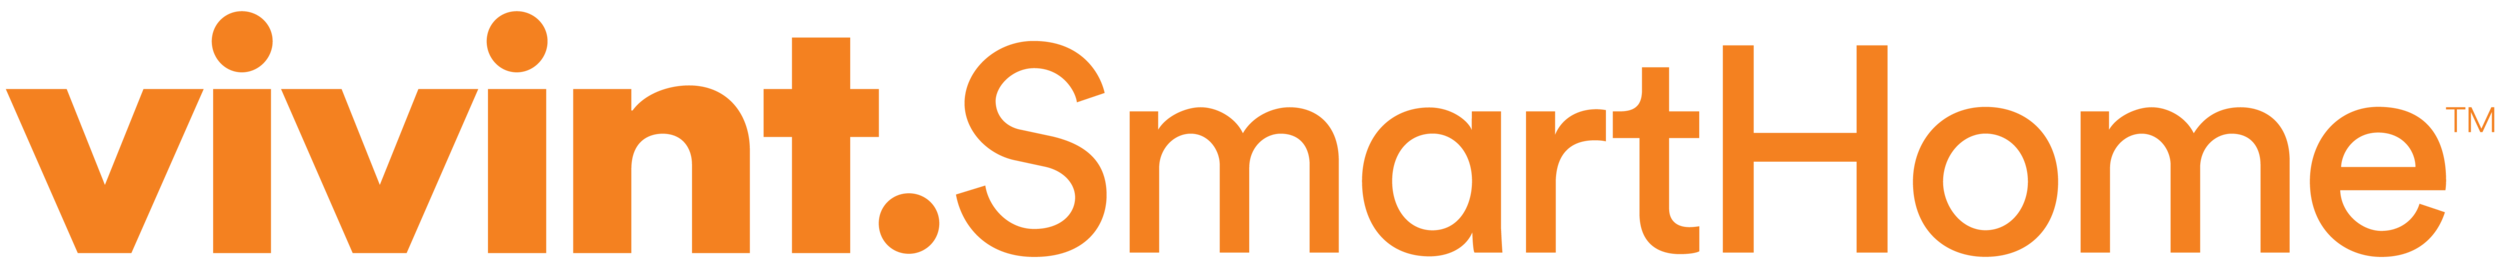 Vivint Smart Home Logo.horizontal.png